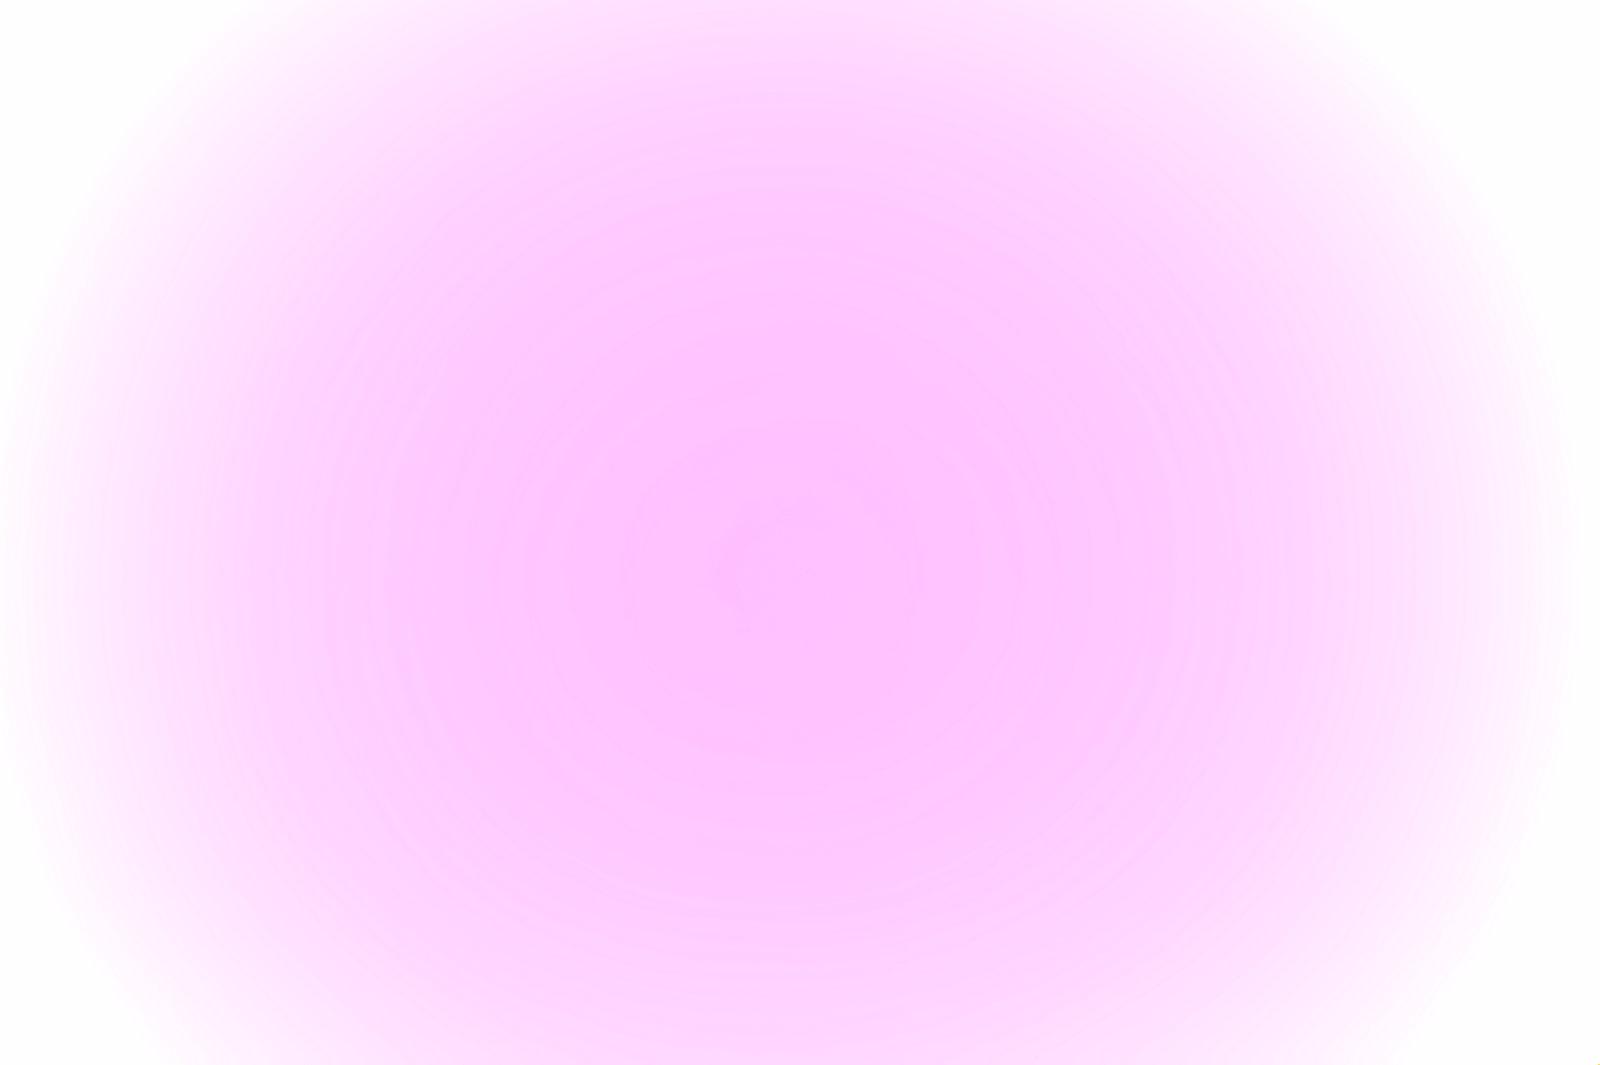 e0253132_21464257.jpg